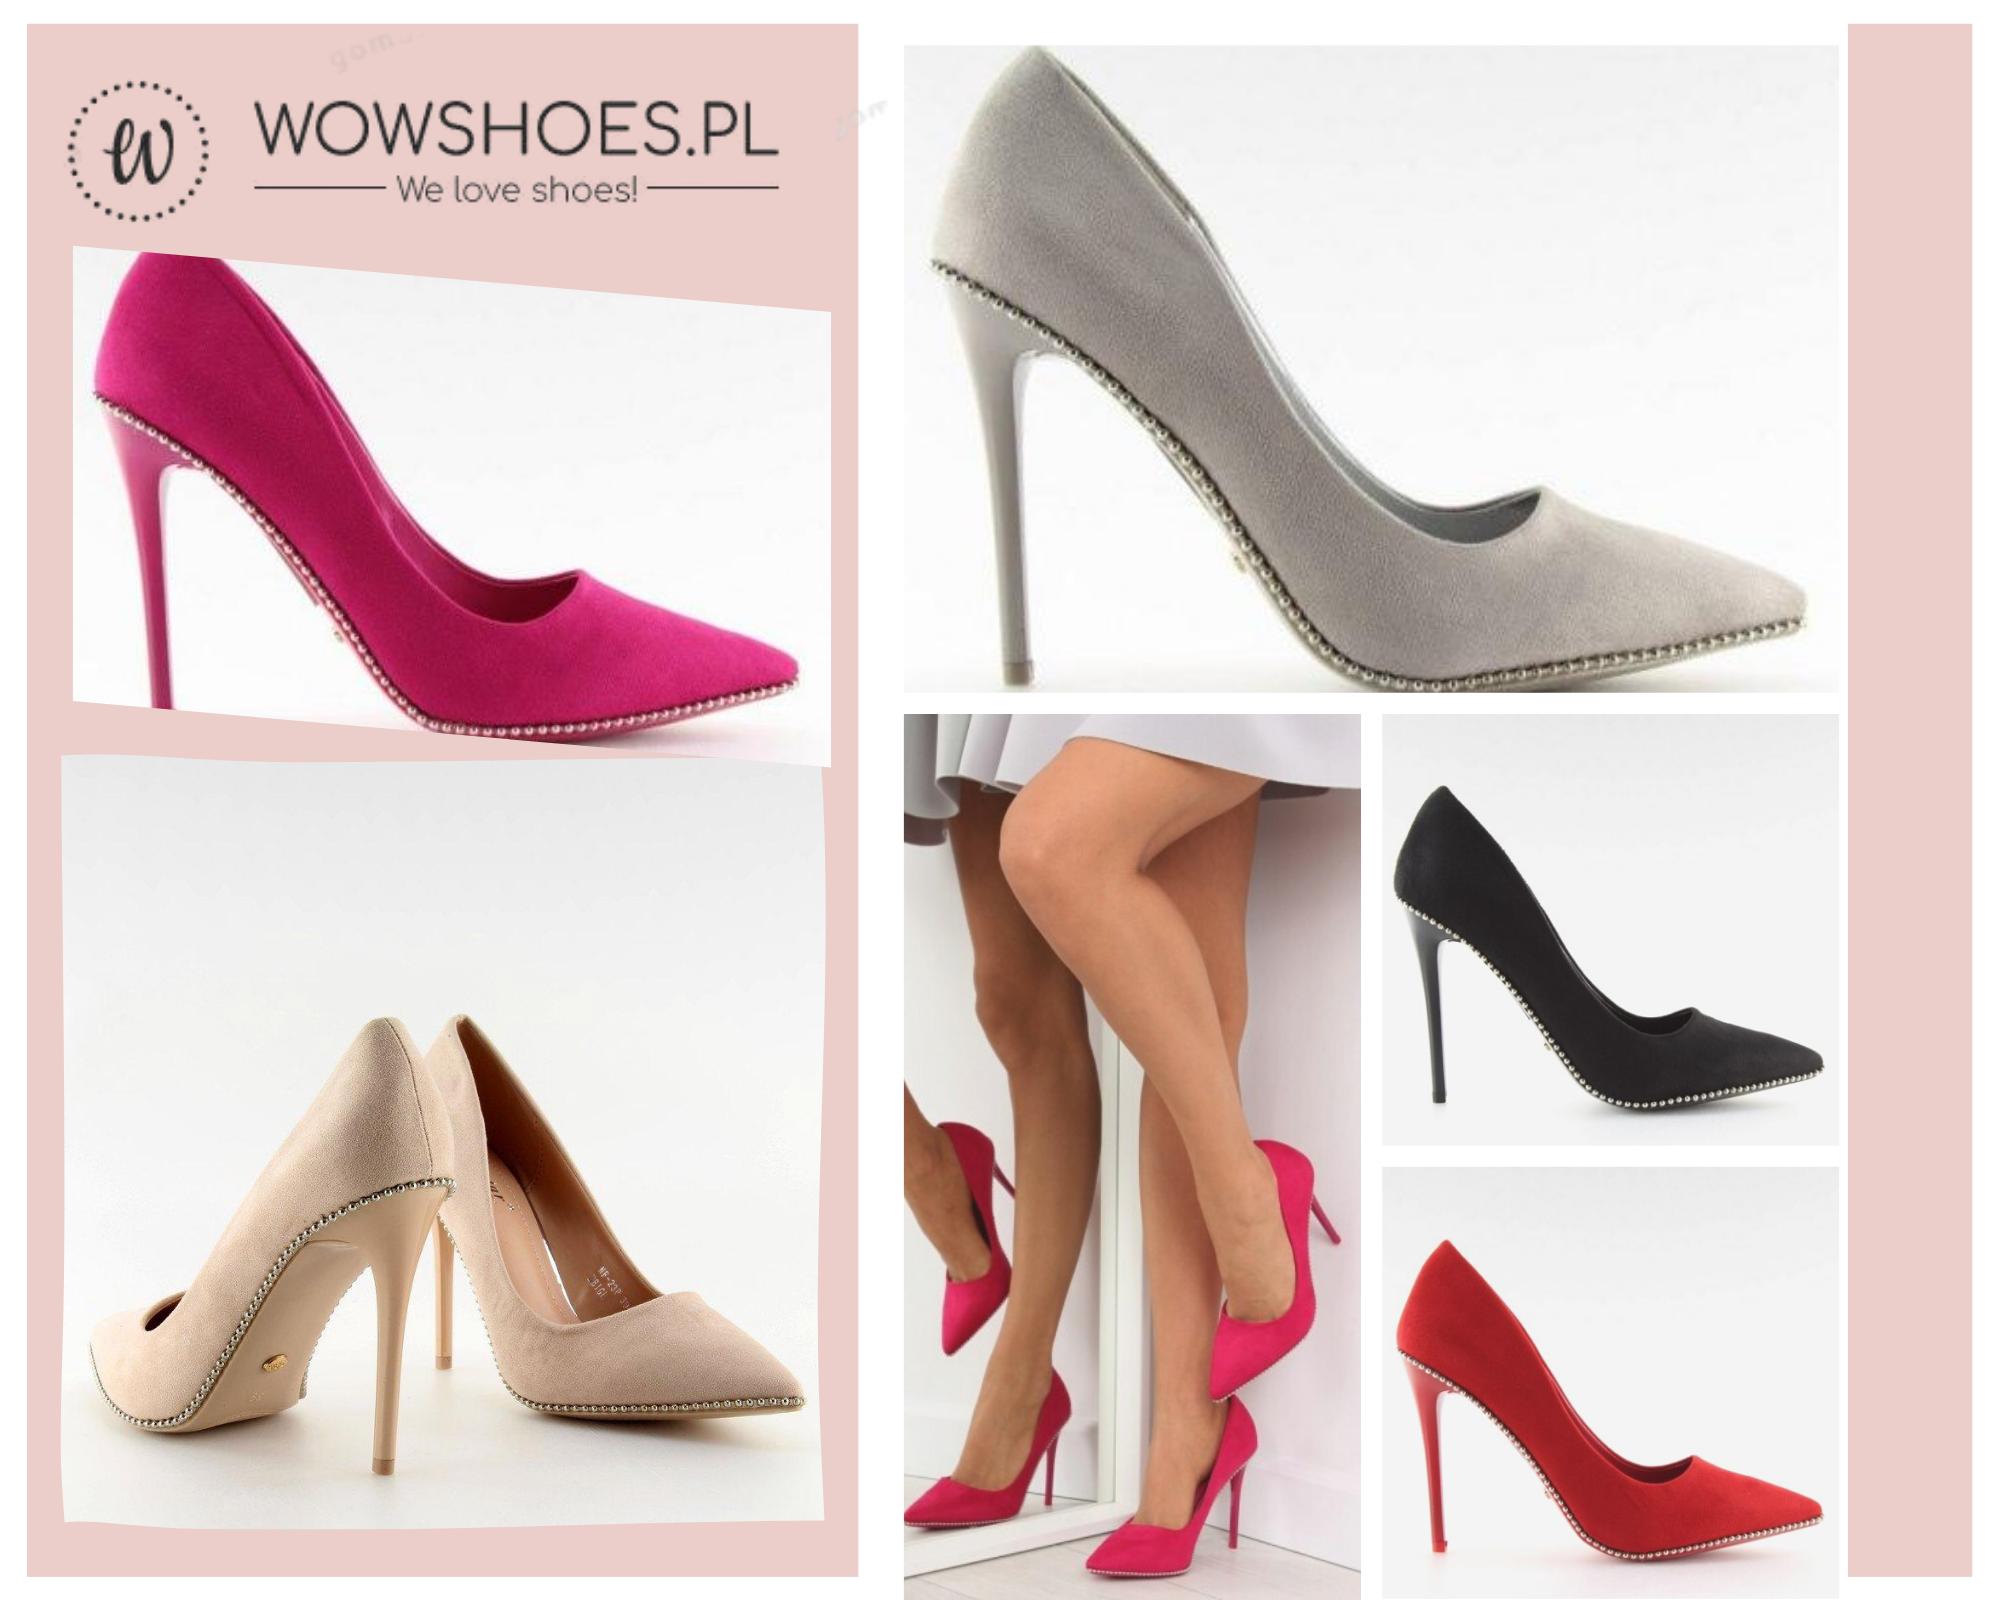 Szpilki Wowshoes Pl Stiletto Heels Stiletto Heels